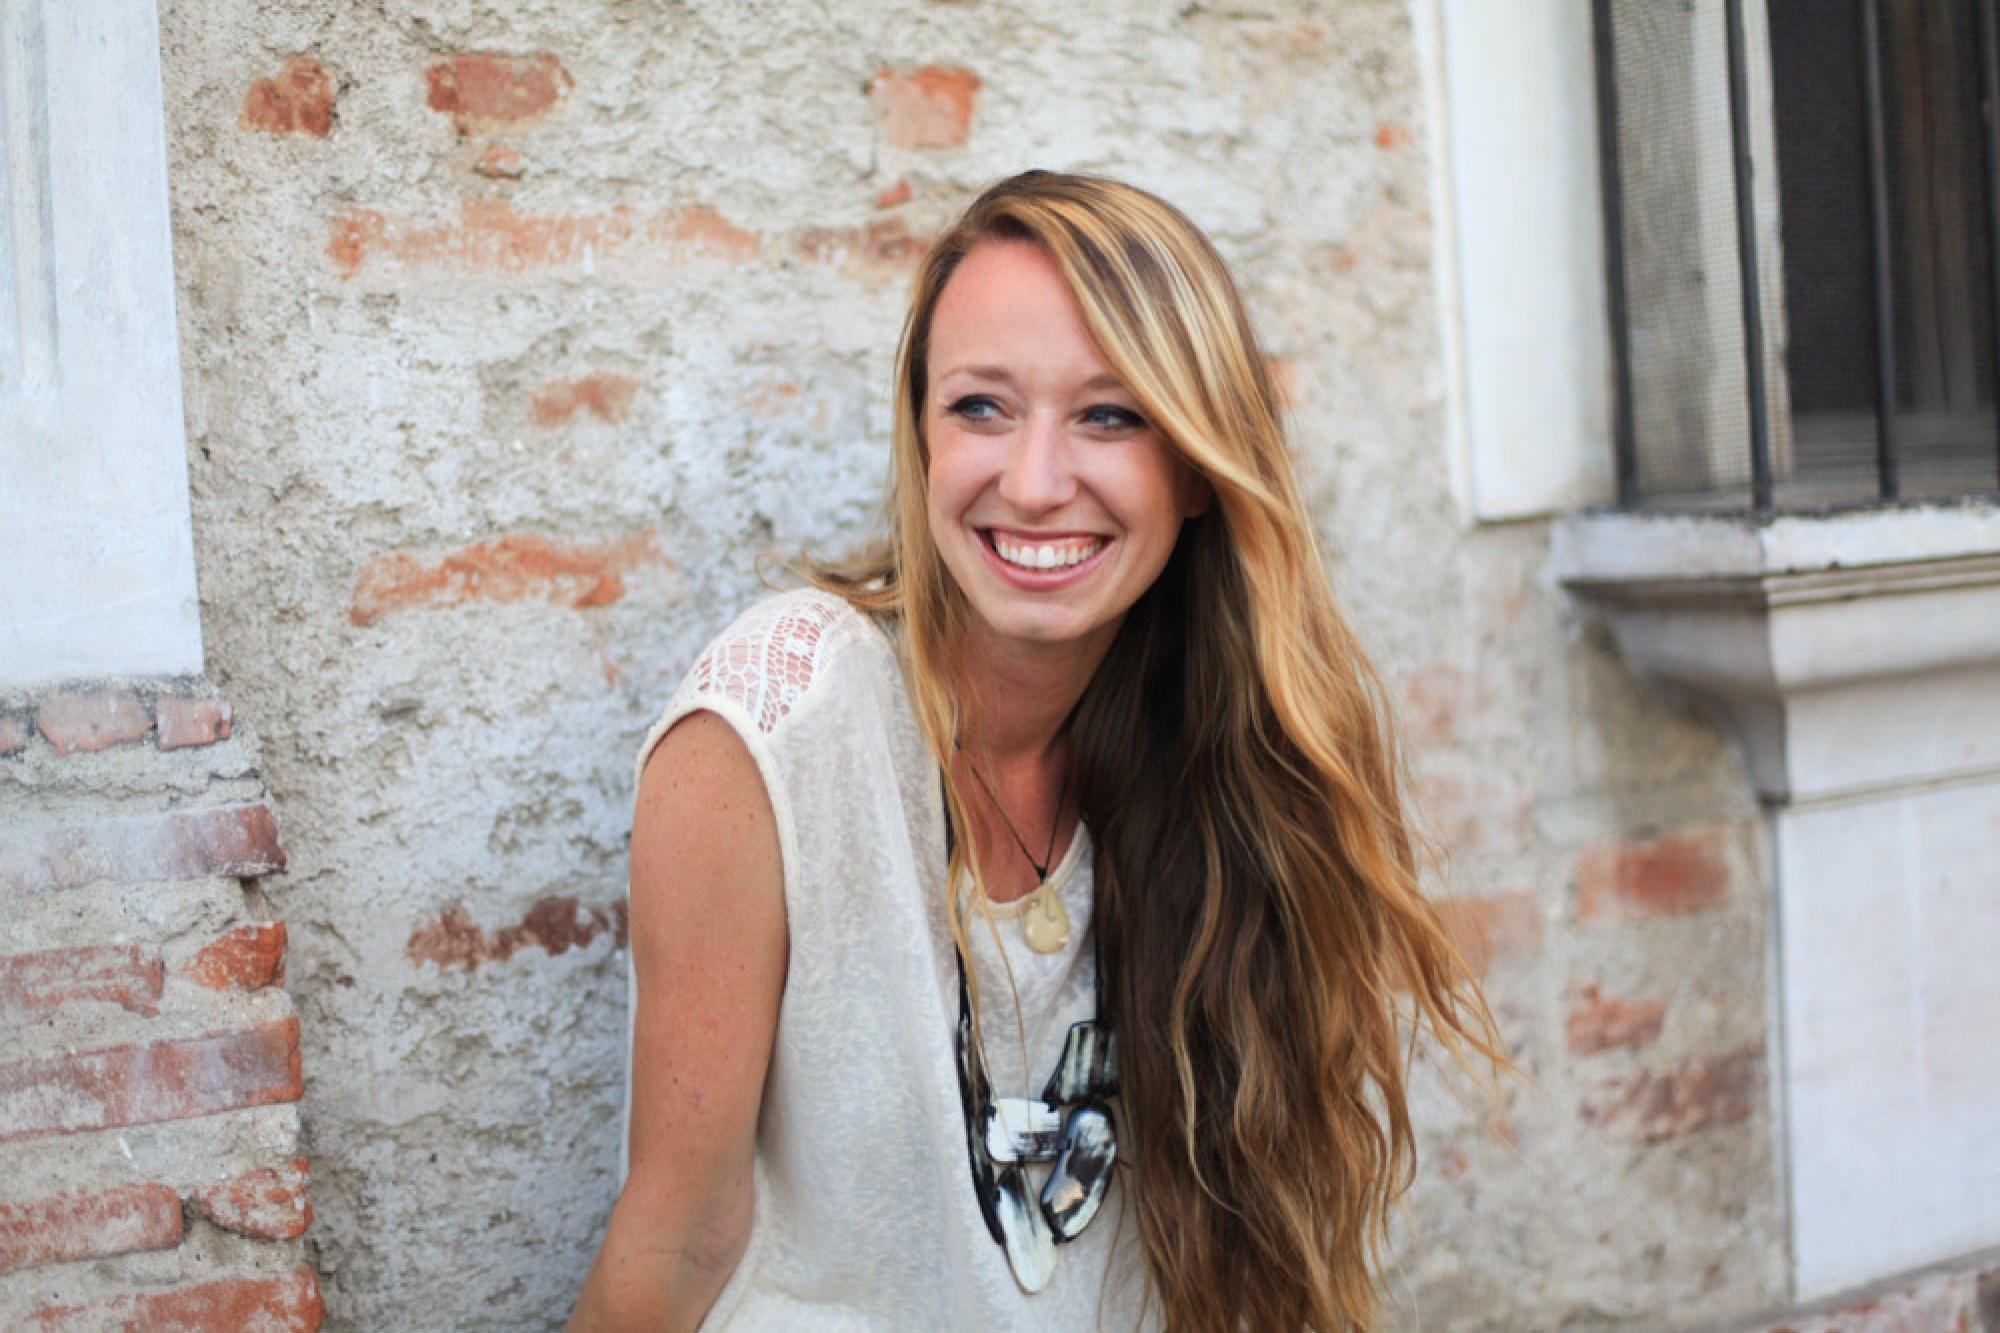 Candace Rose Rardon - Top female travel blogger - best writing